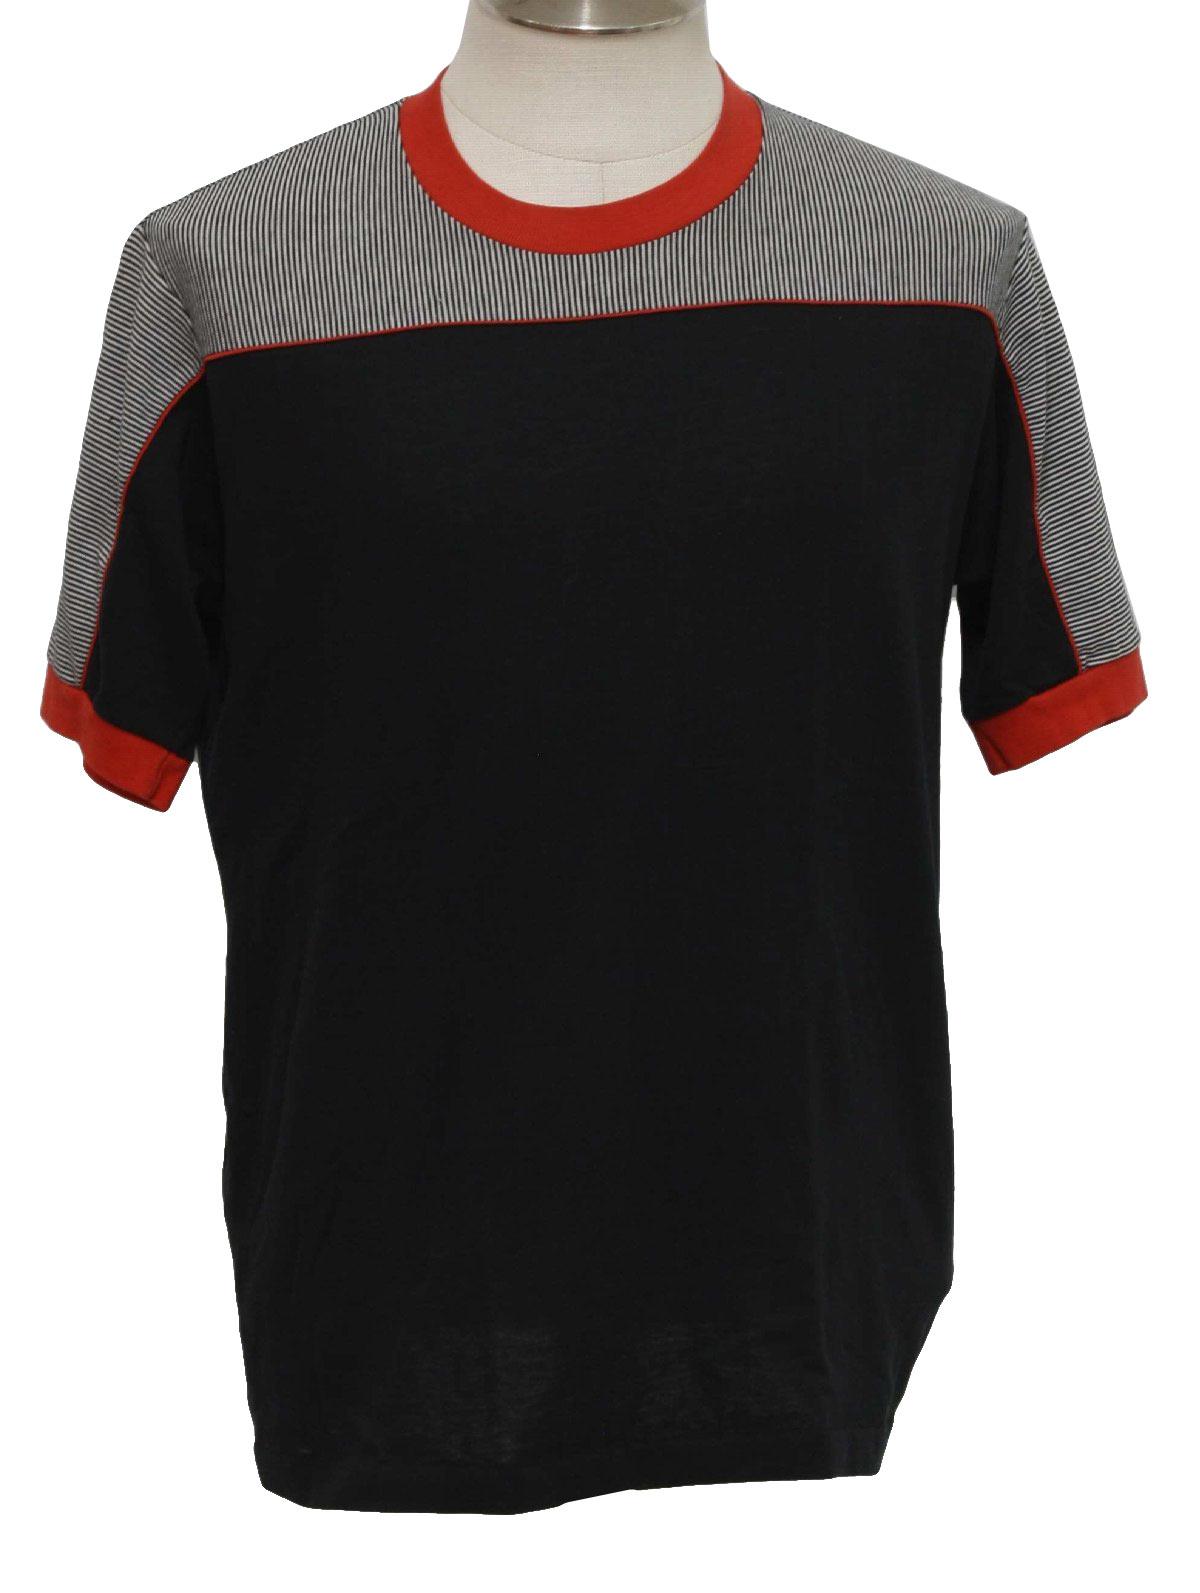 Retro eighties t shirt 80s jockey mens black white and for Jockey full sleeve t shirts india